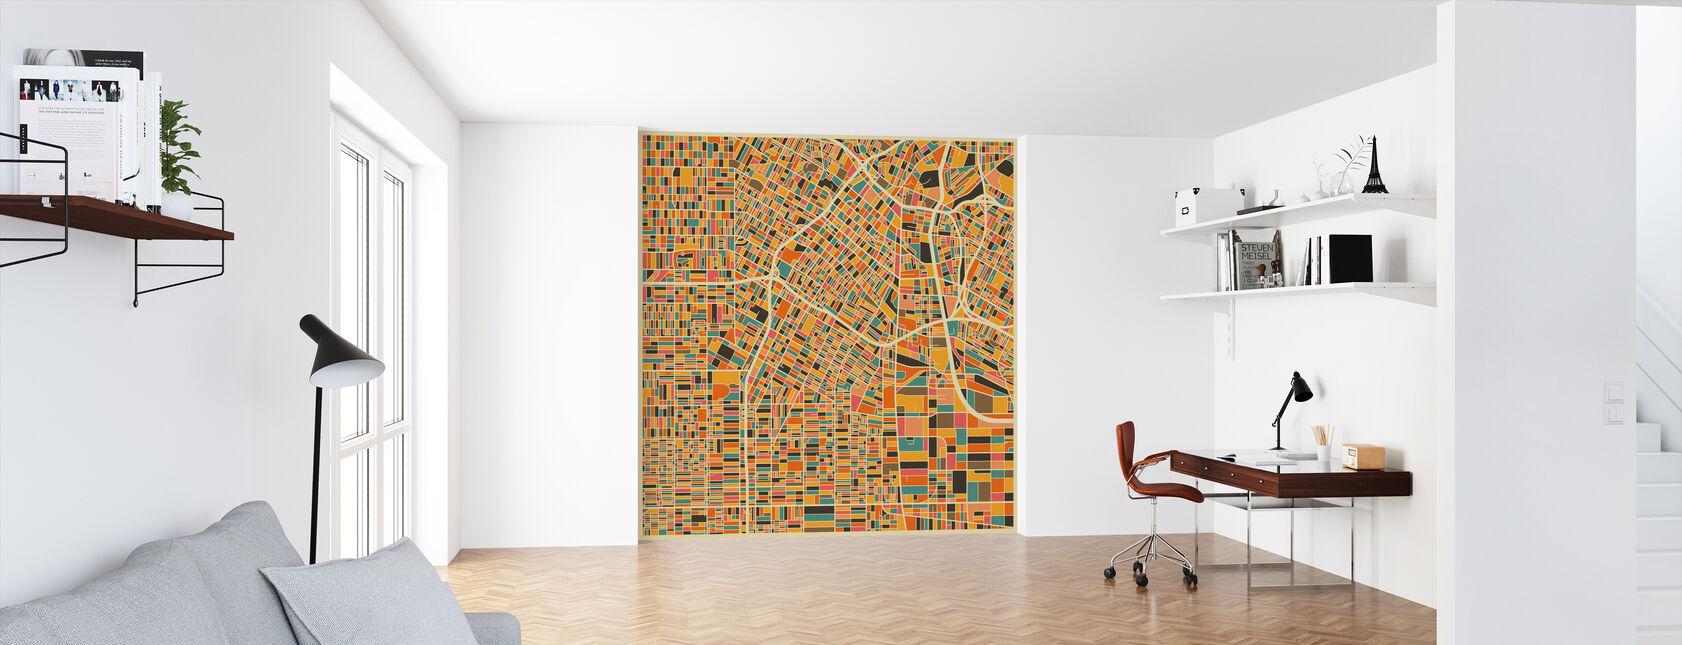 Karte - Los Angeles - Tapet - Kontor